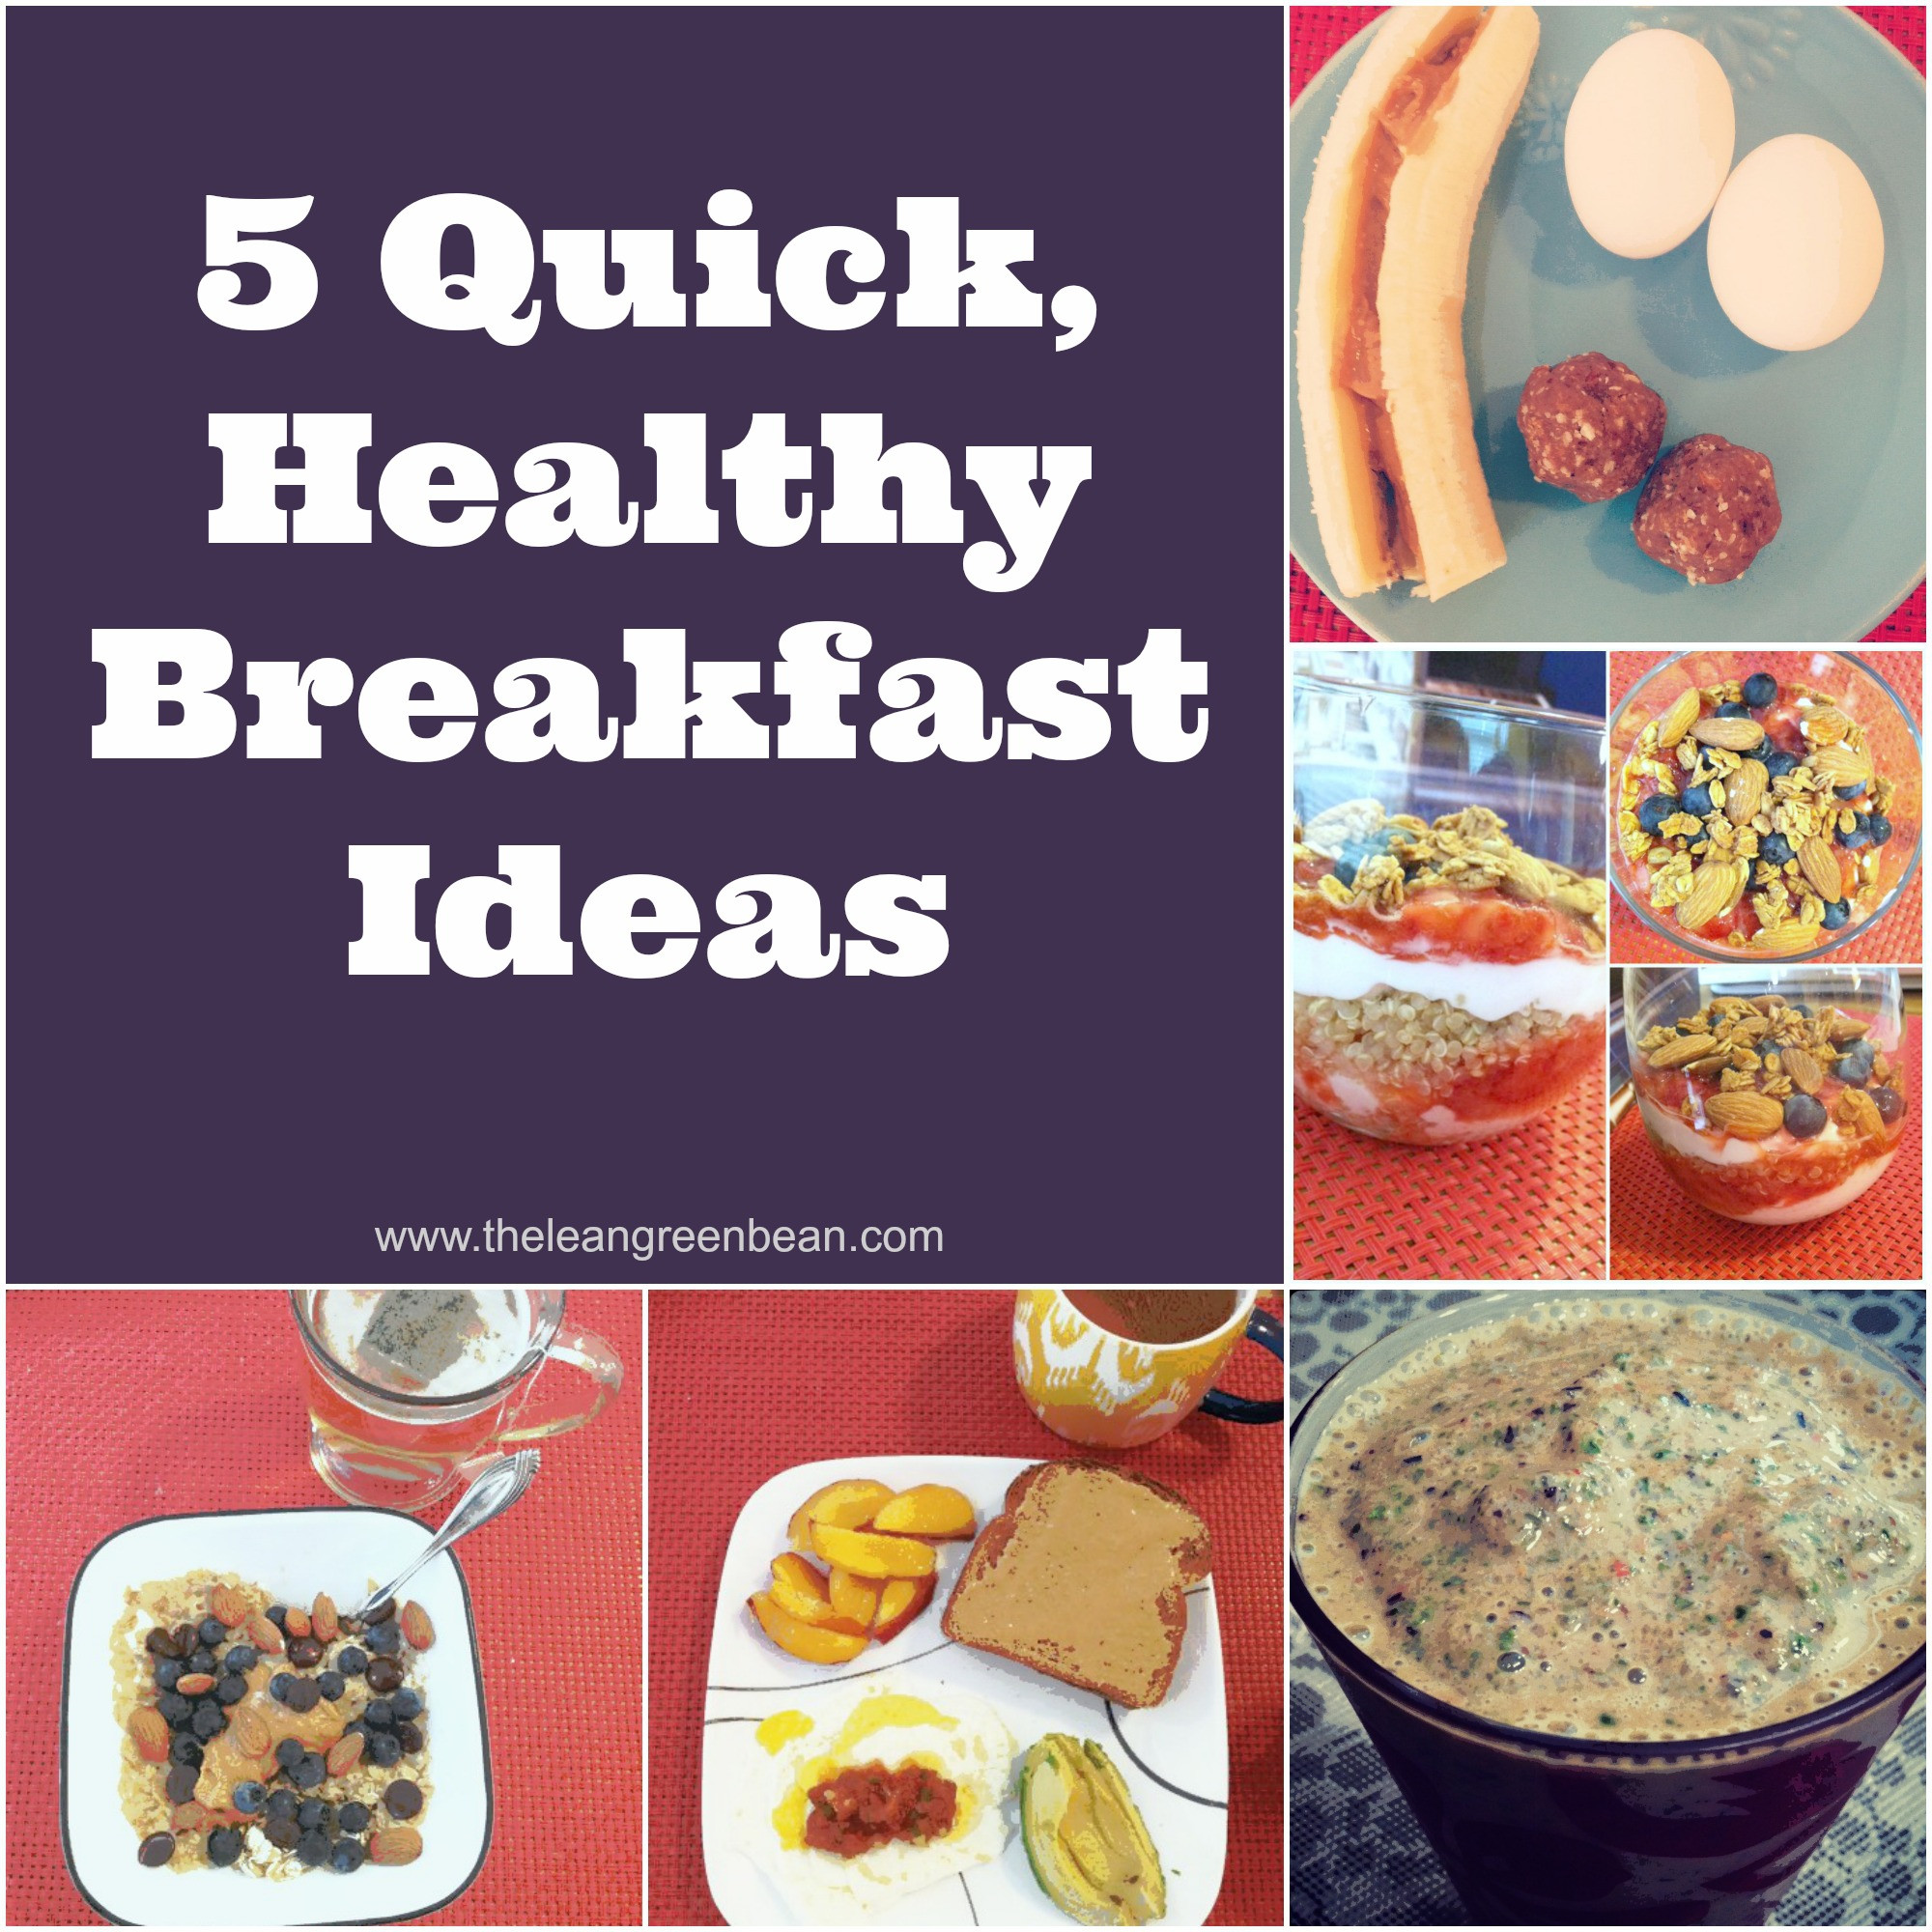 Good Healthy Breakfast Ideas  5 Quick Healthy Breakfast Ideas from a Registered Dietitian